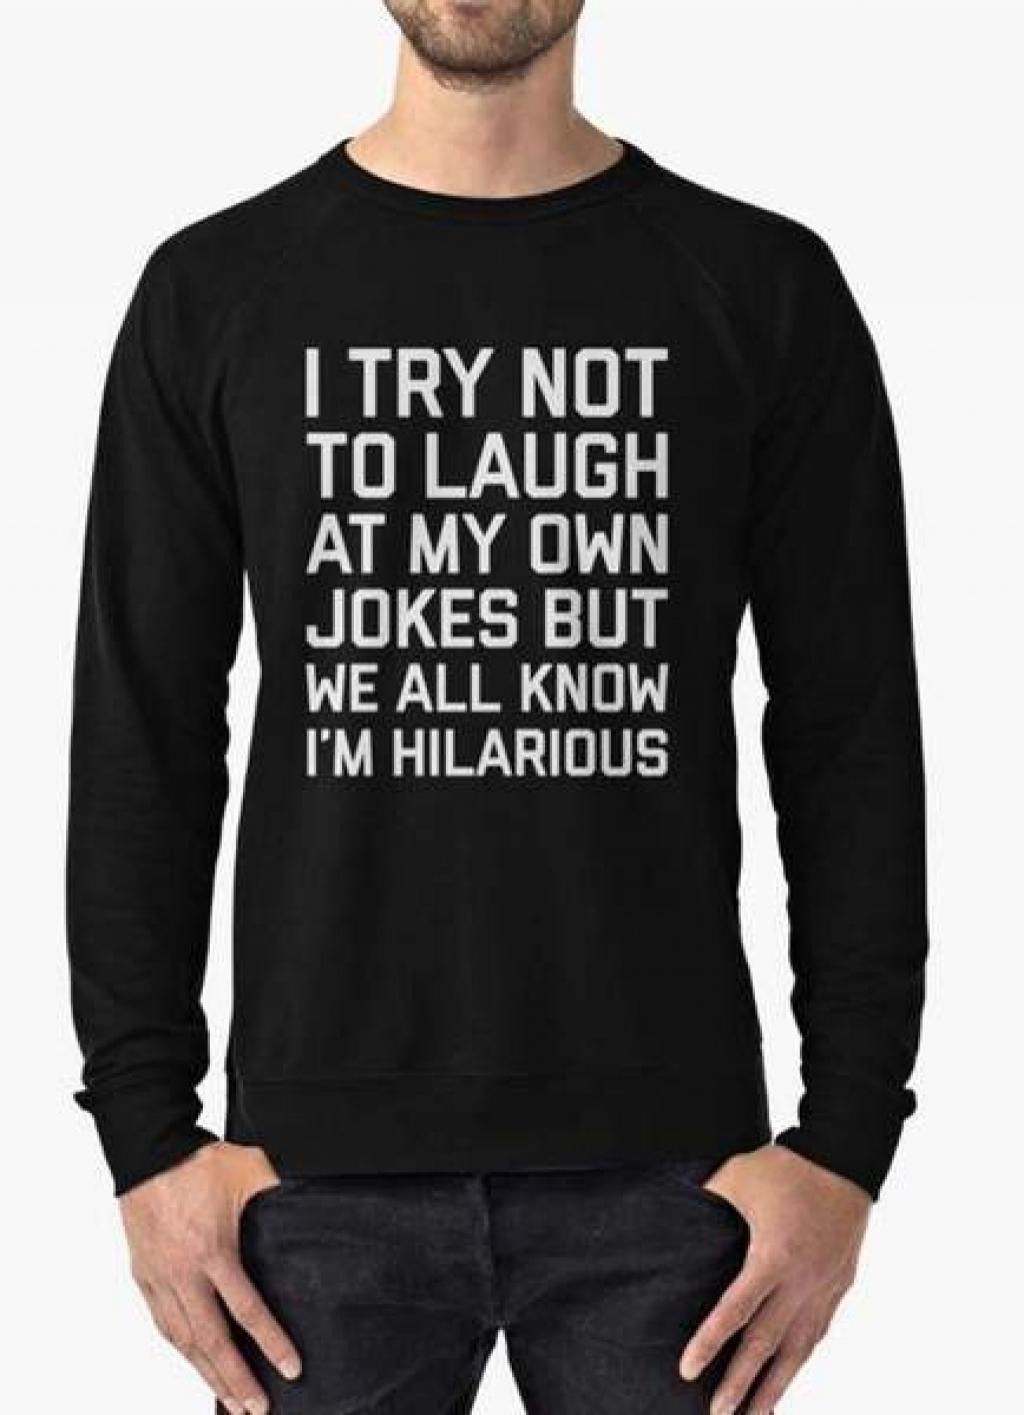 15409176960_manahil-sweat-shirt-i-try-not-to-laugh-sweat-shirt-3908027547736_grande.jpg